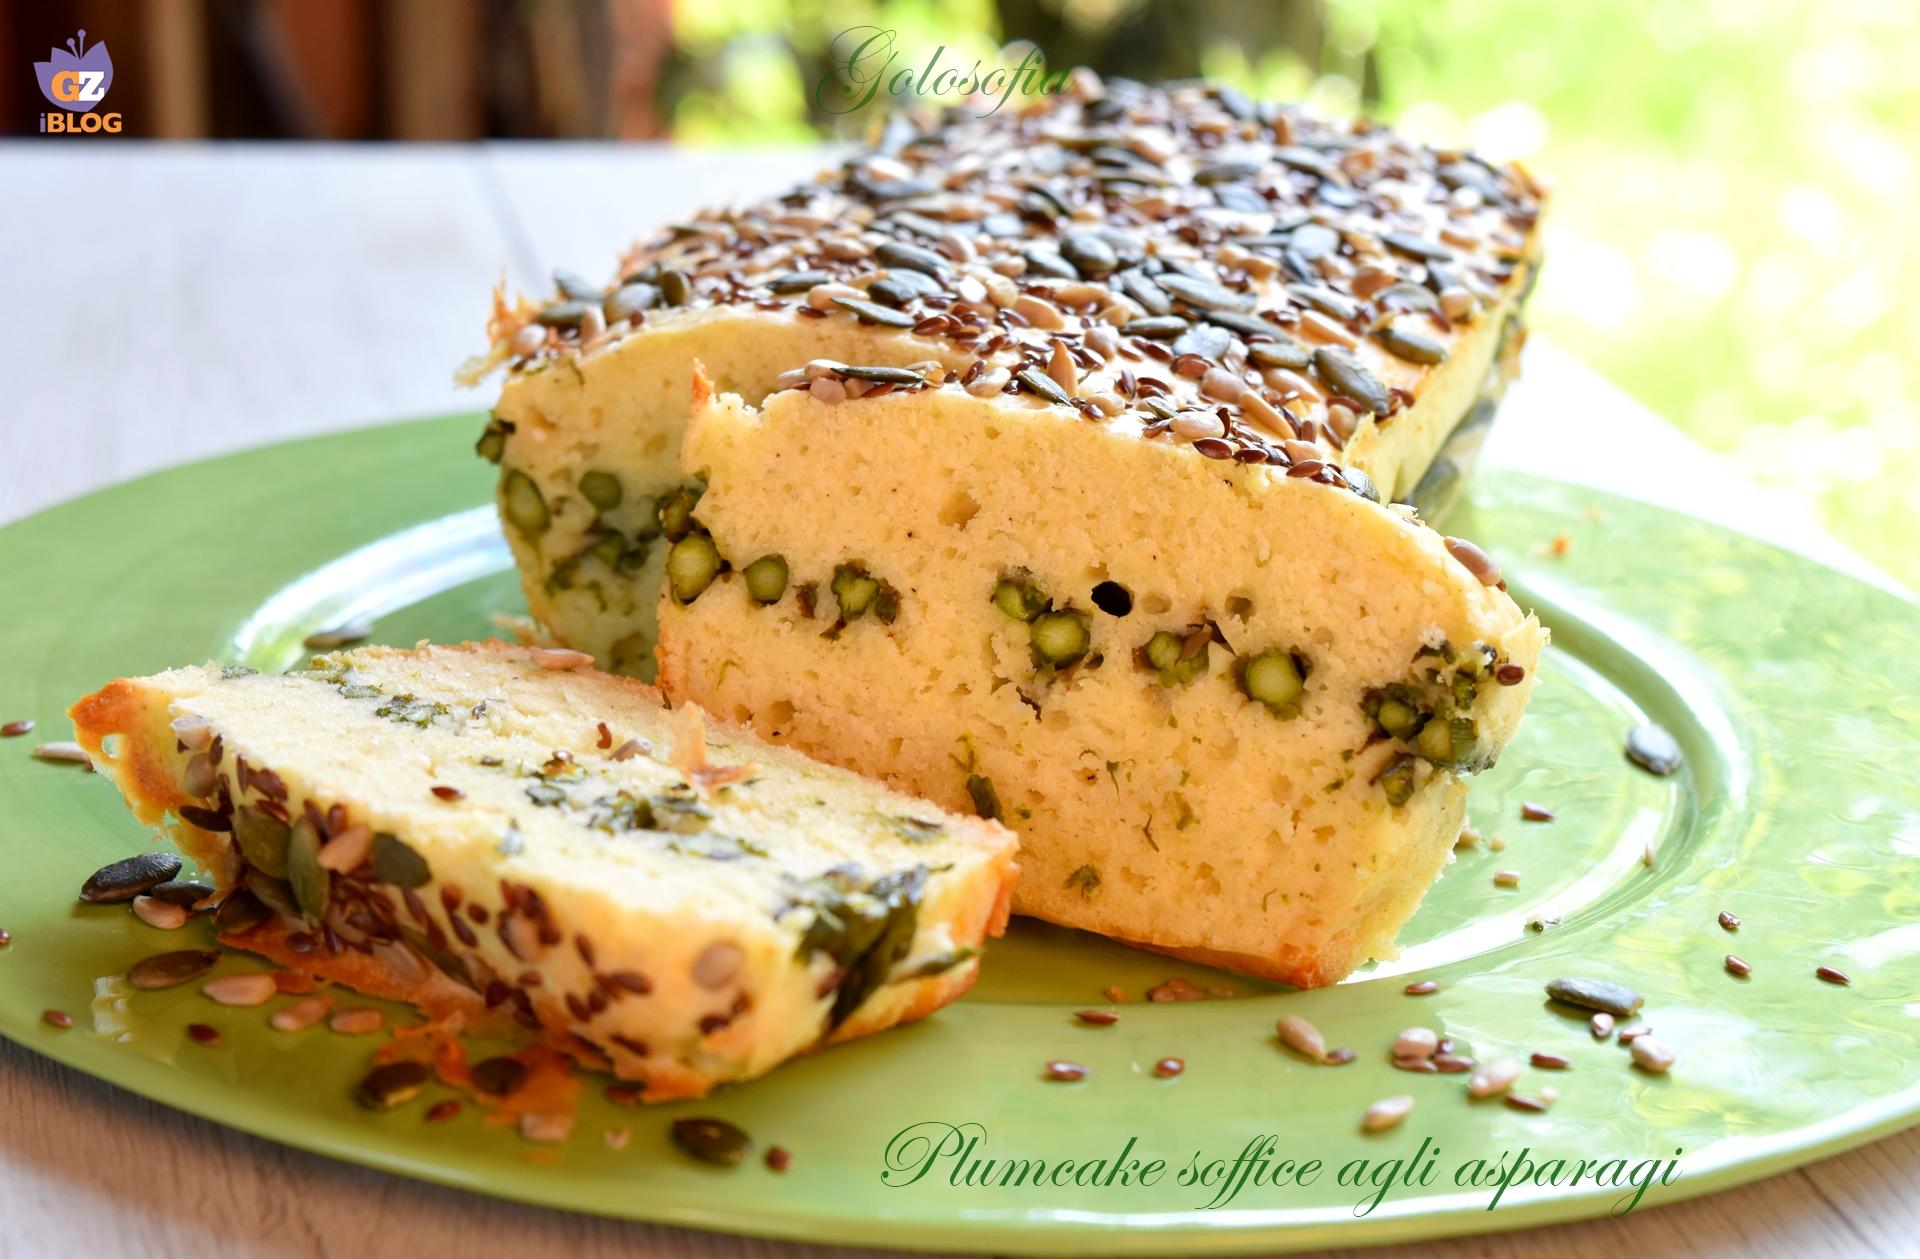 Plumcake soffice agli asparagi-ricetta plumcake-golosofia